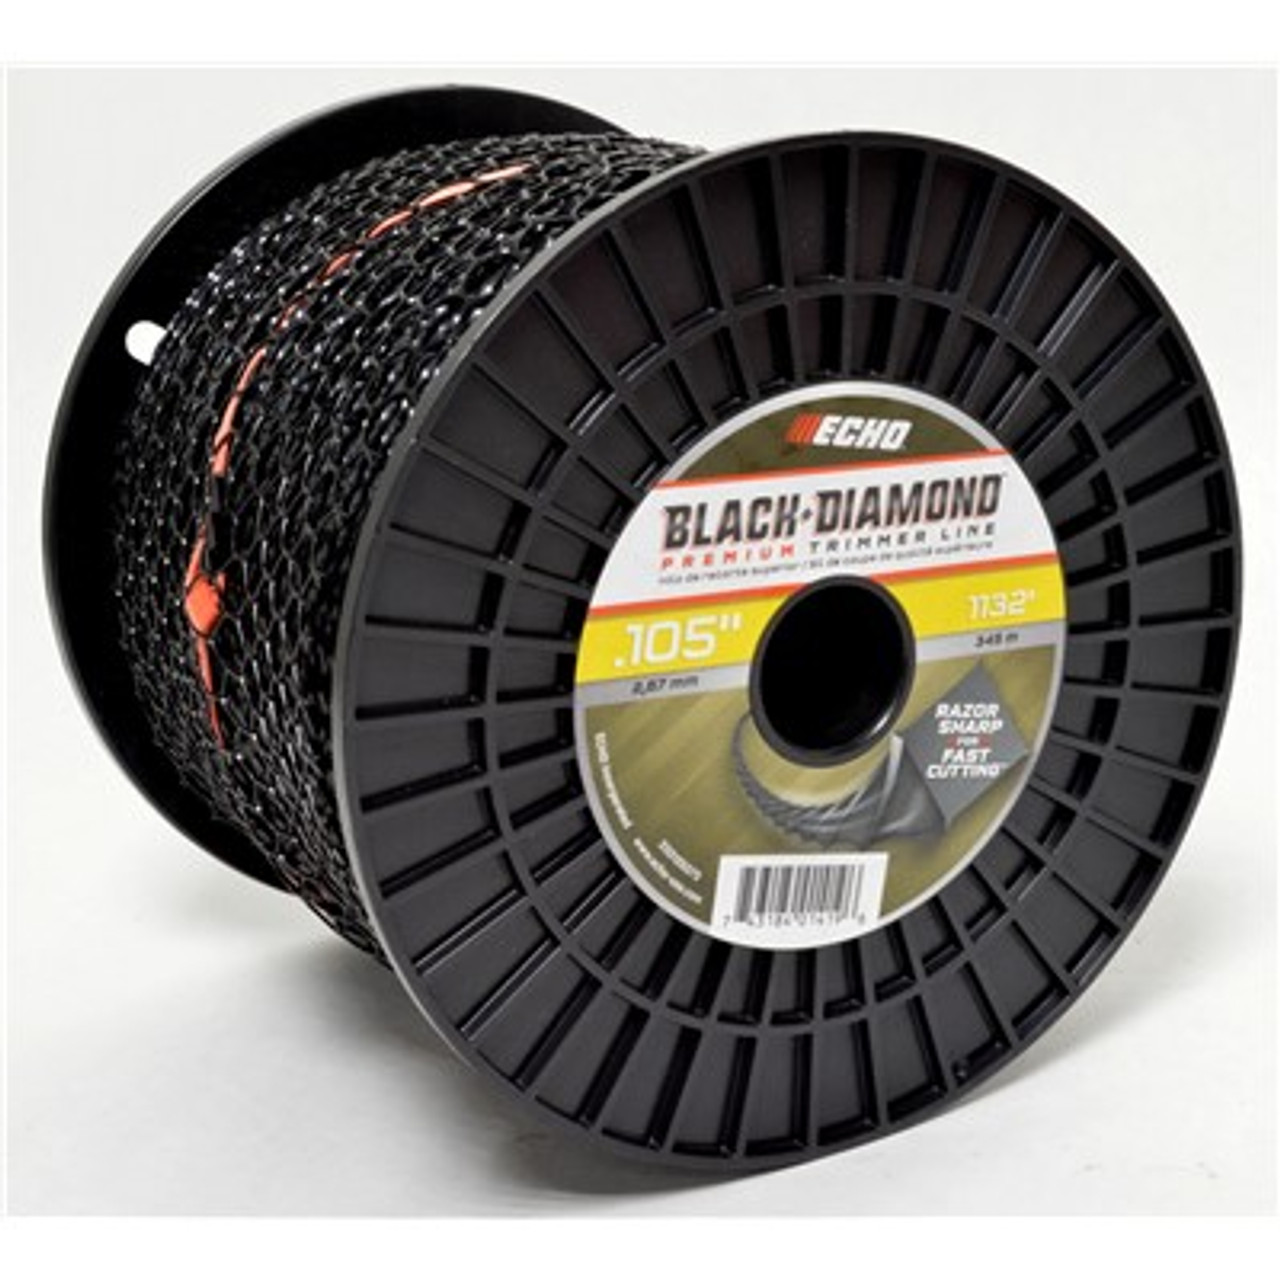 Echo Srm, Gt, .105 Black Diamond Trimmer Line 1132 Feet, 5lb spool, Professional Grade 330105075